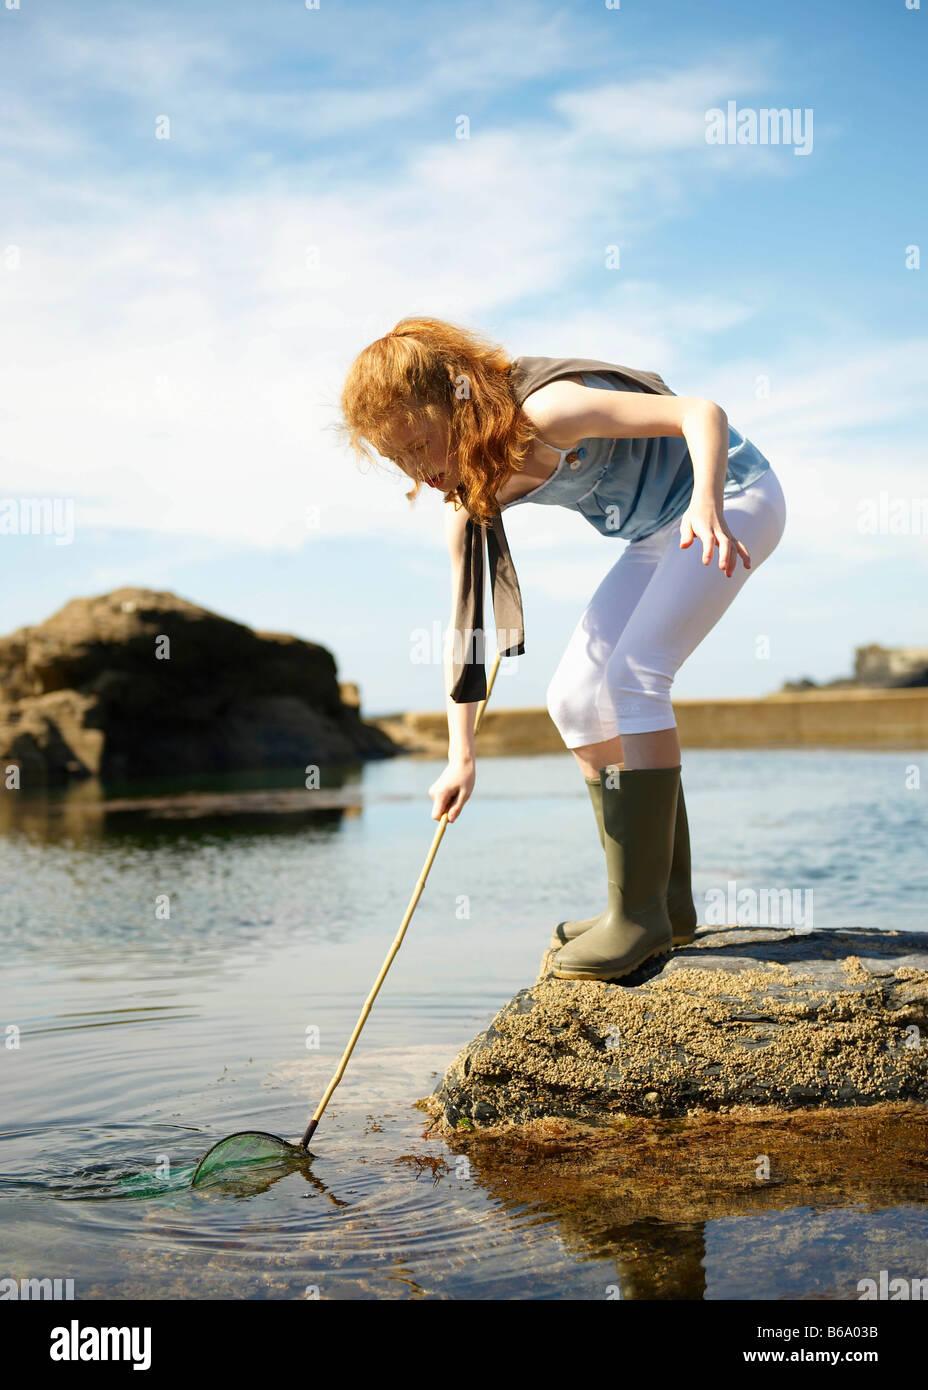 Young girl fishing in rock pool - Stock Image